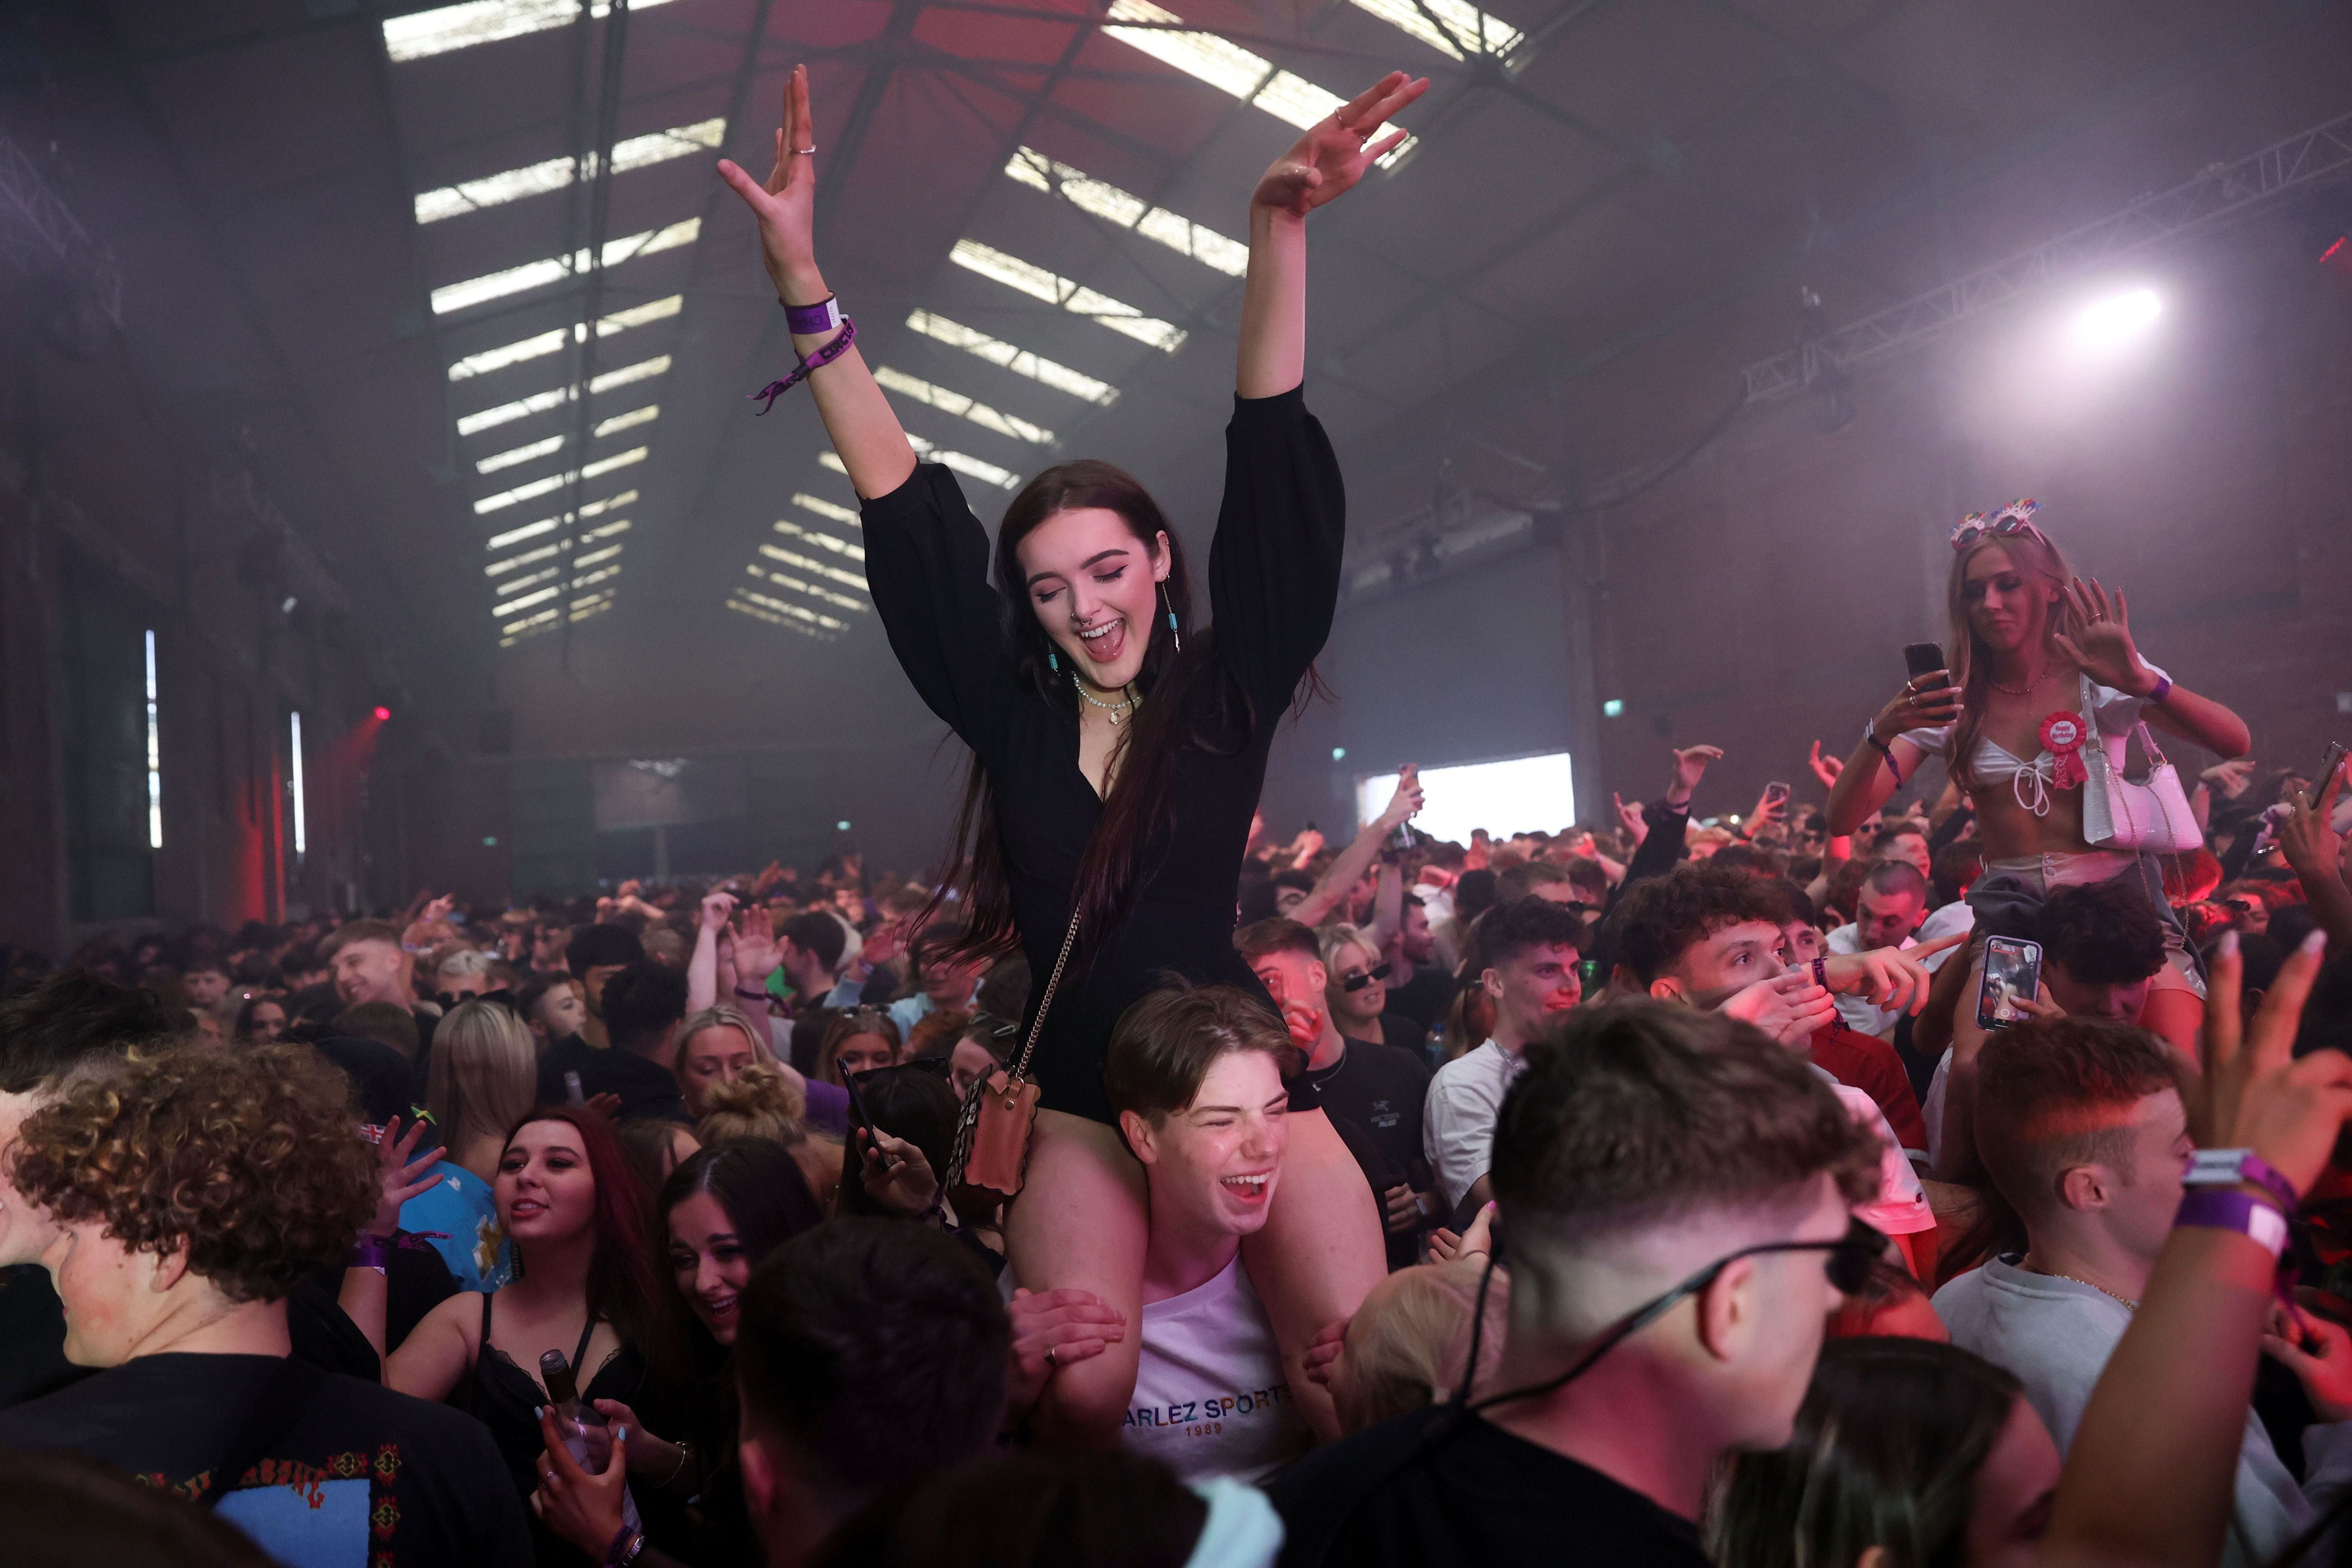 Liverpool, Reino Unido. 30 de abril de 2021. REUTERS/Carl Recine